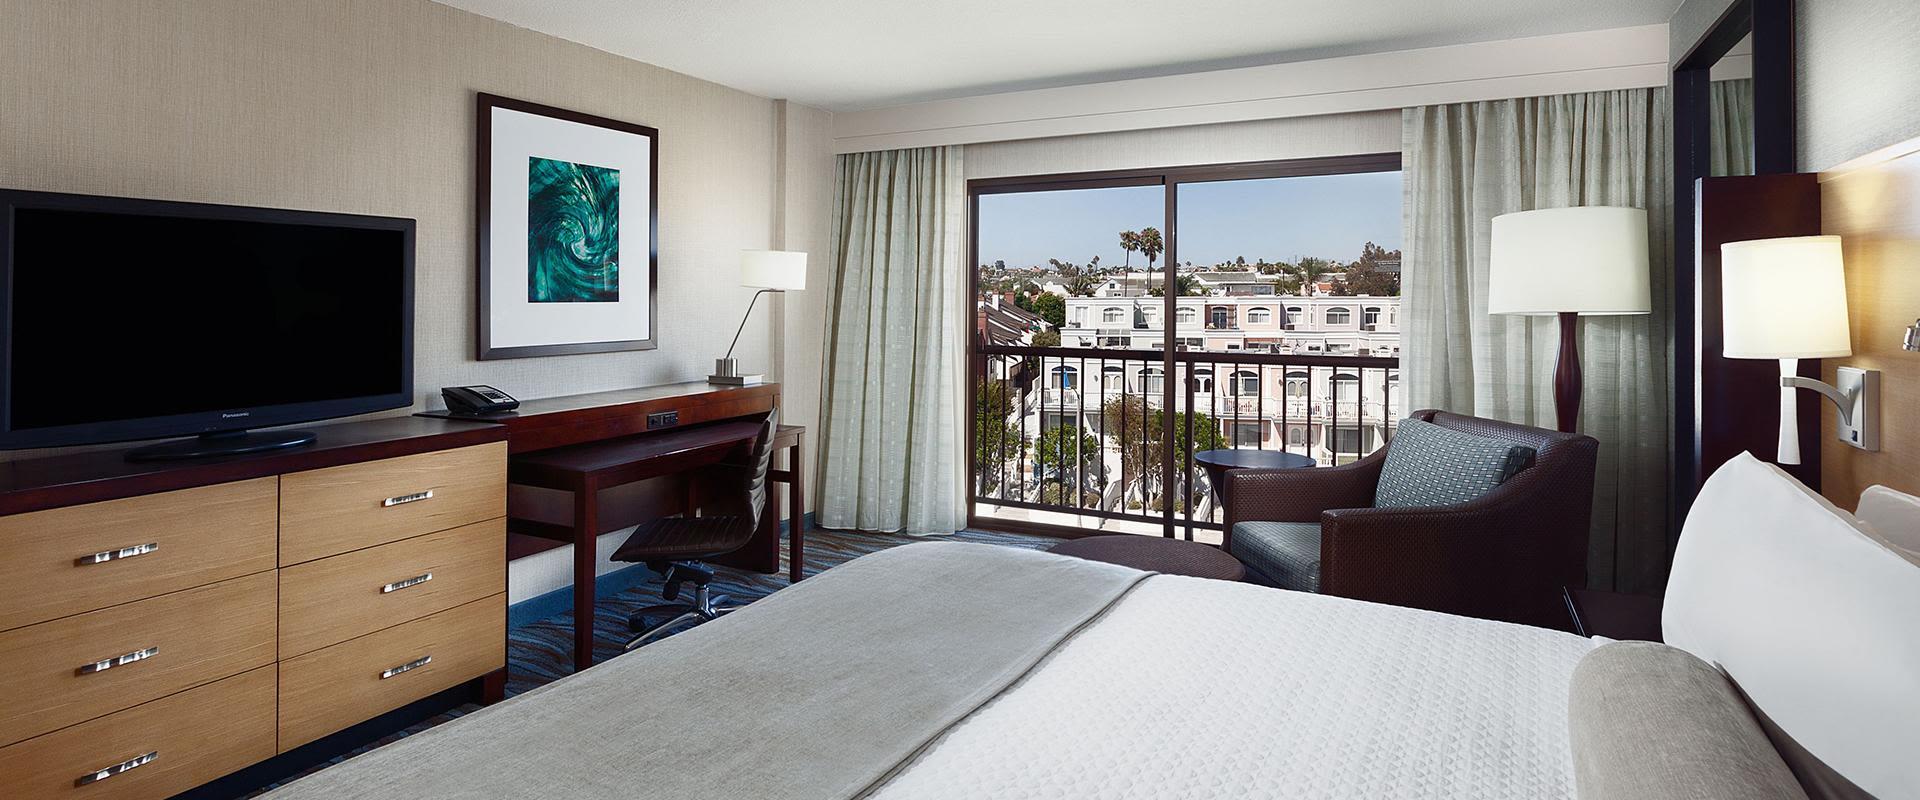 Redondo Beach King Bed ADA Room